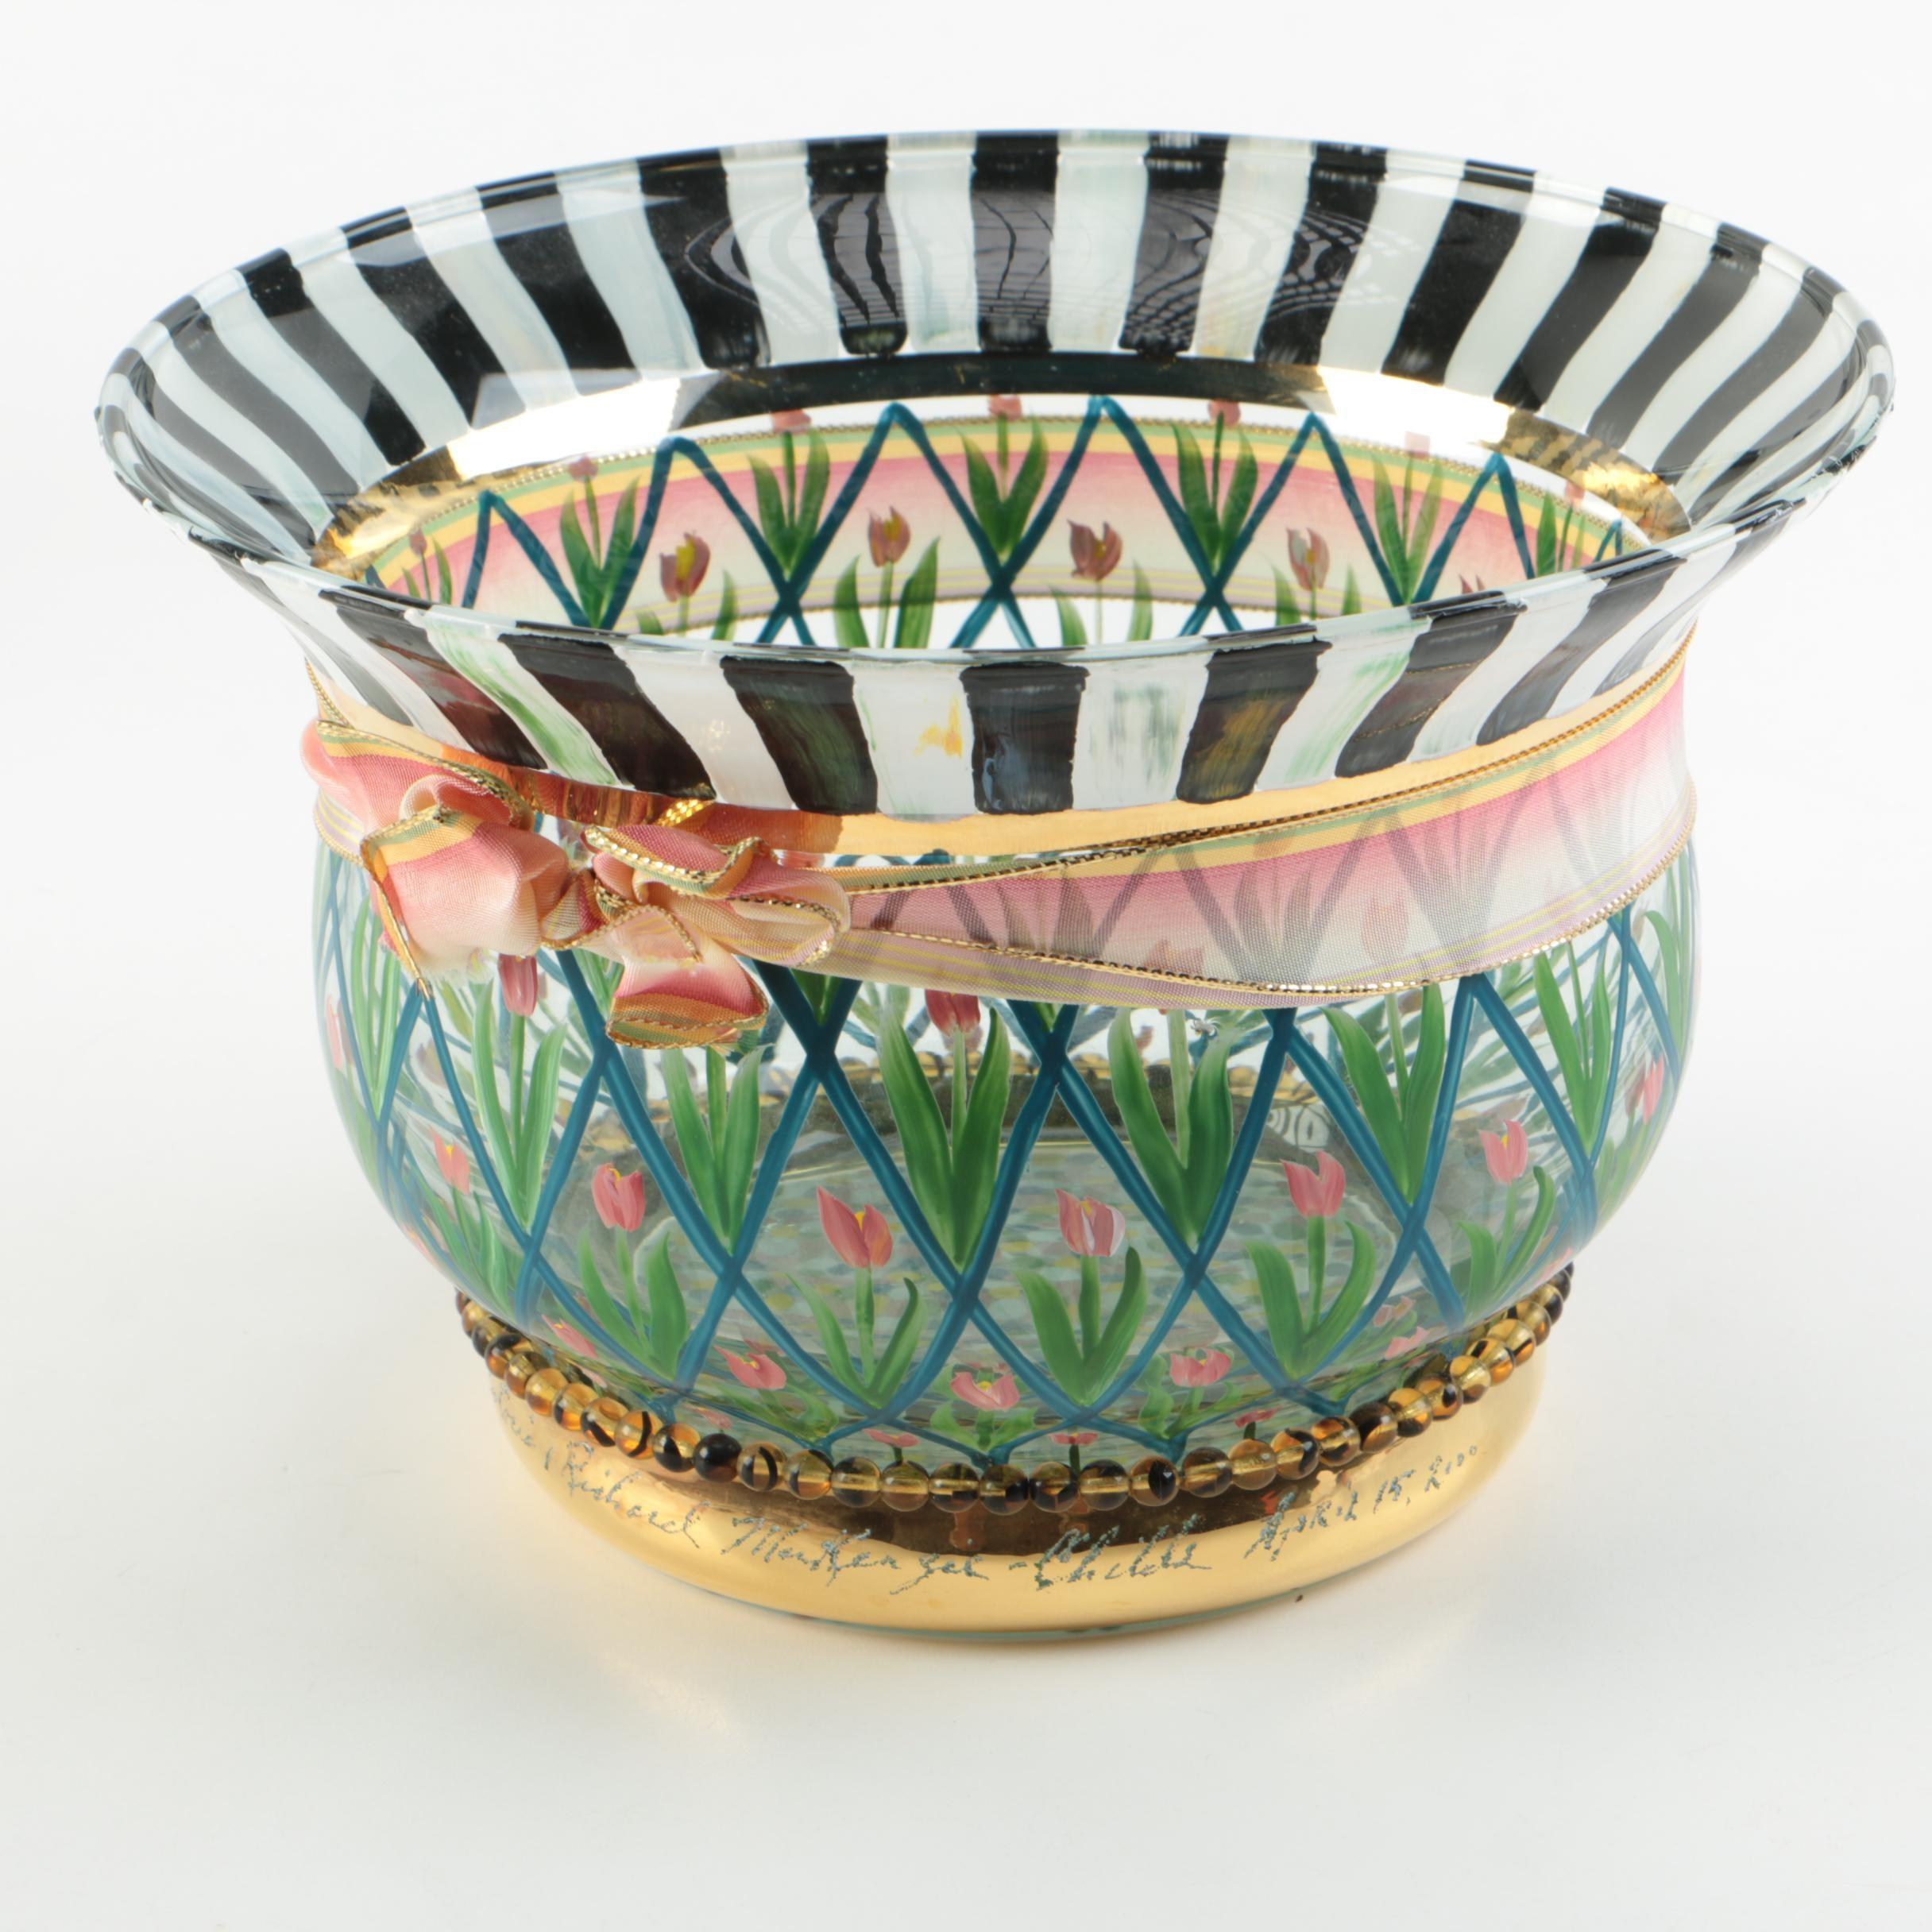 Handcrafted MacKenzie-Childs Art Glass Bowl